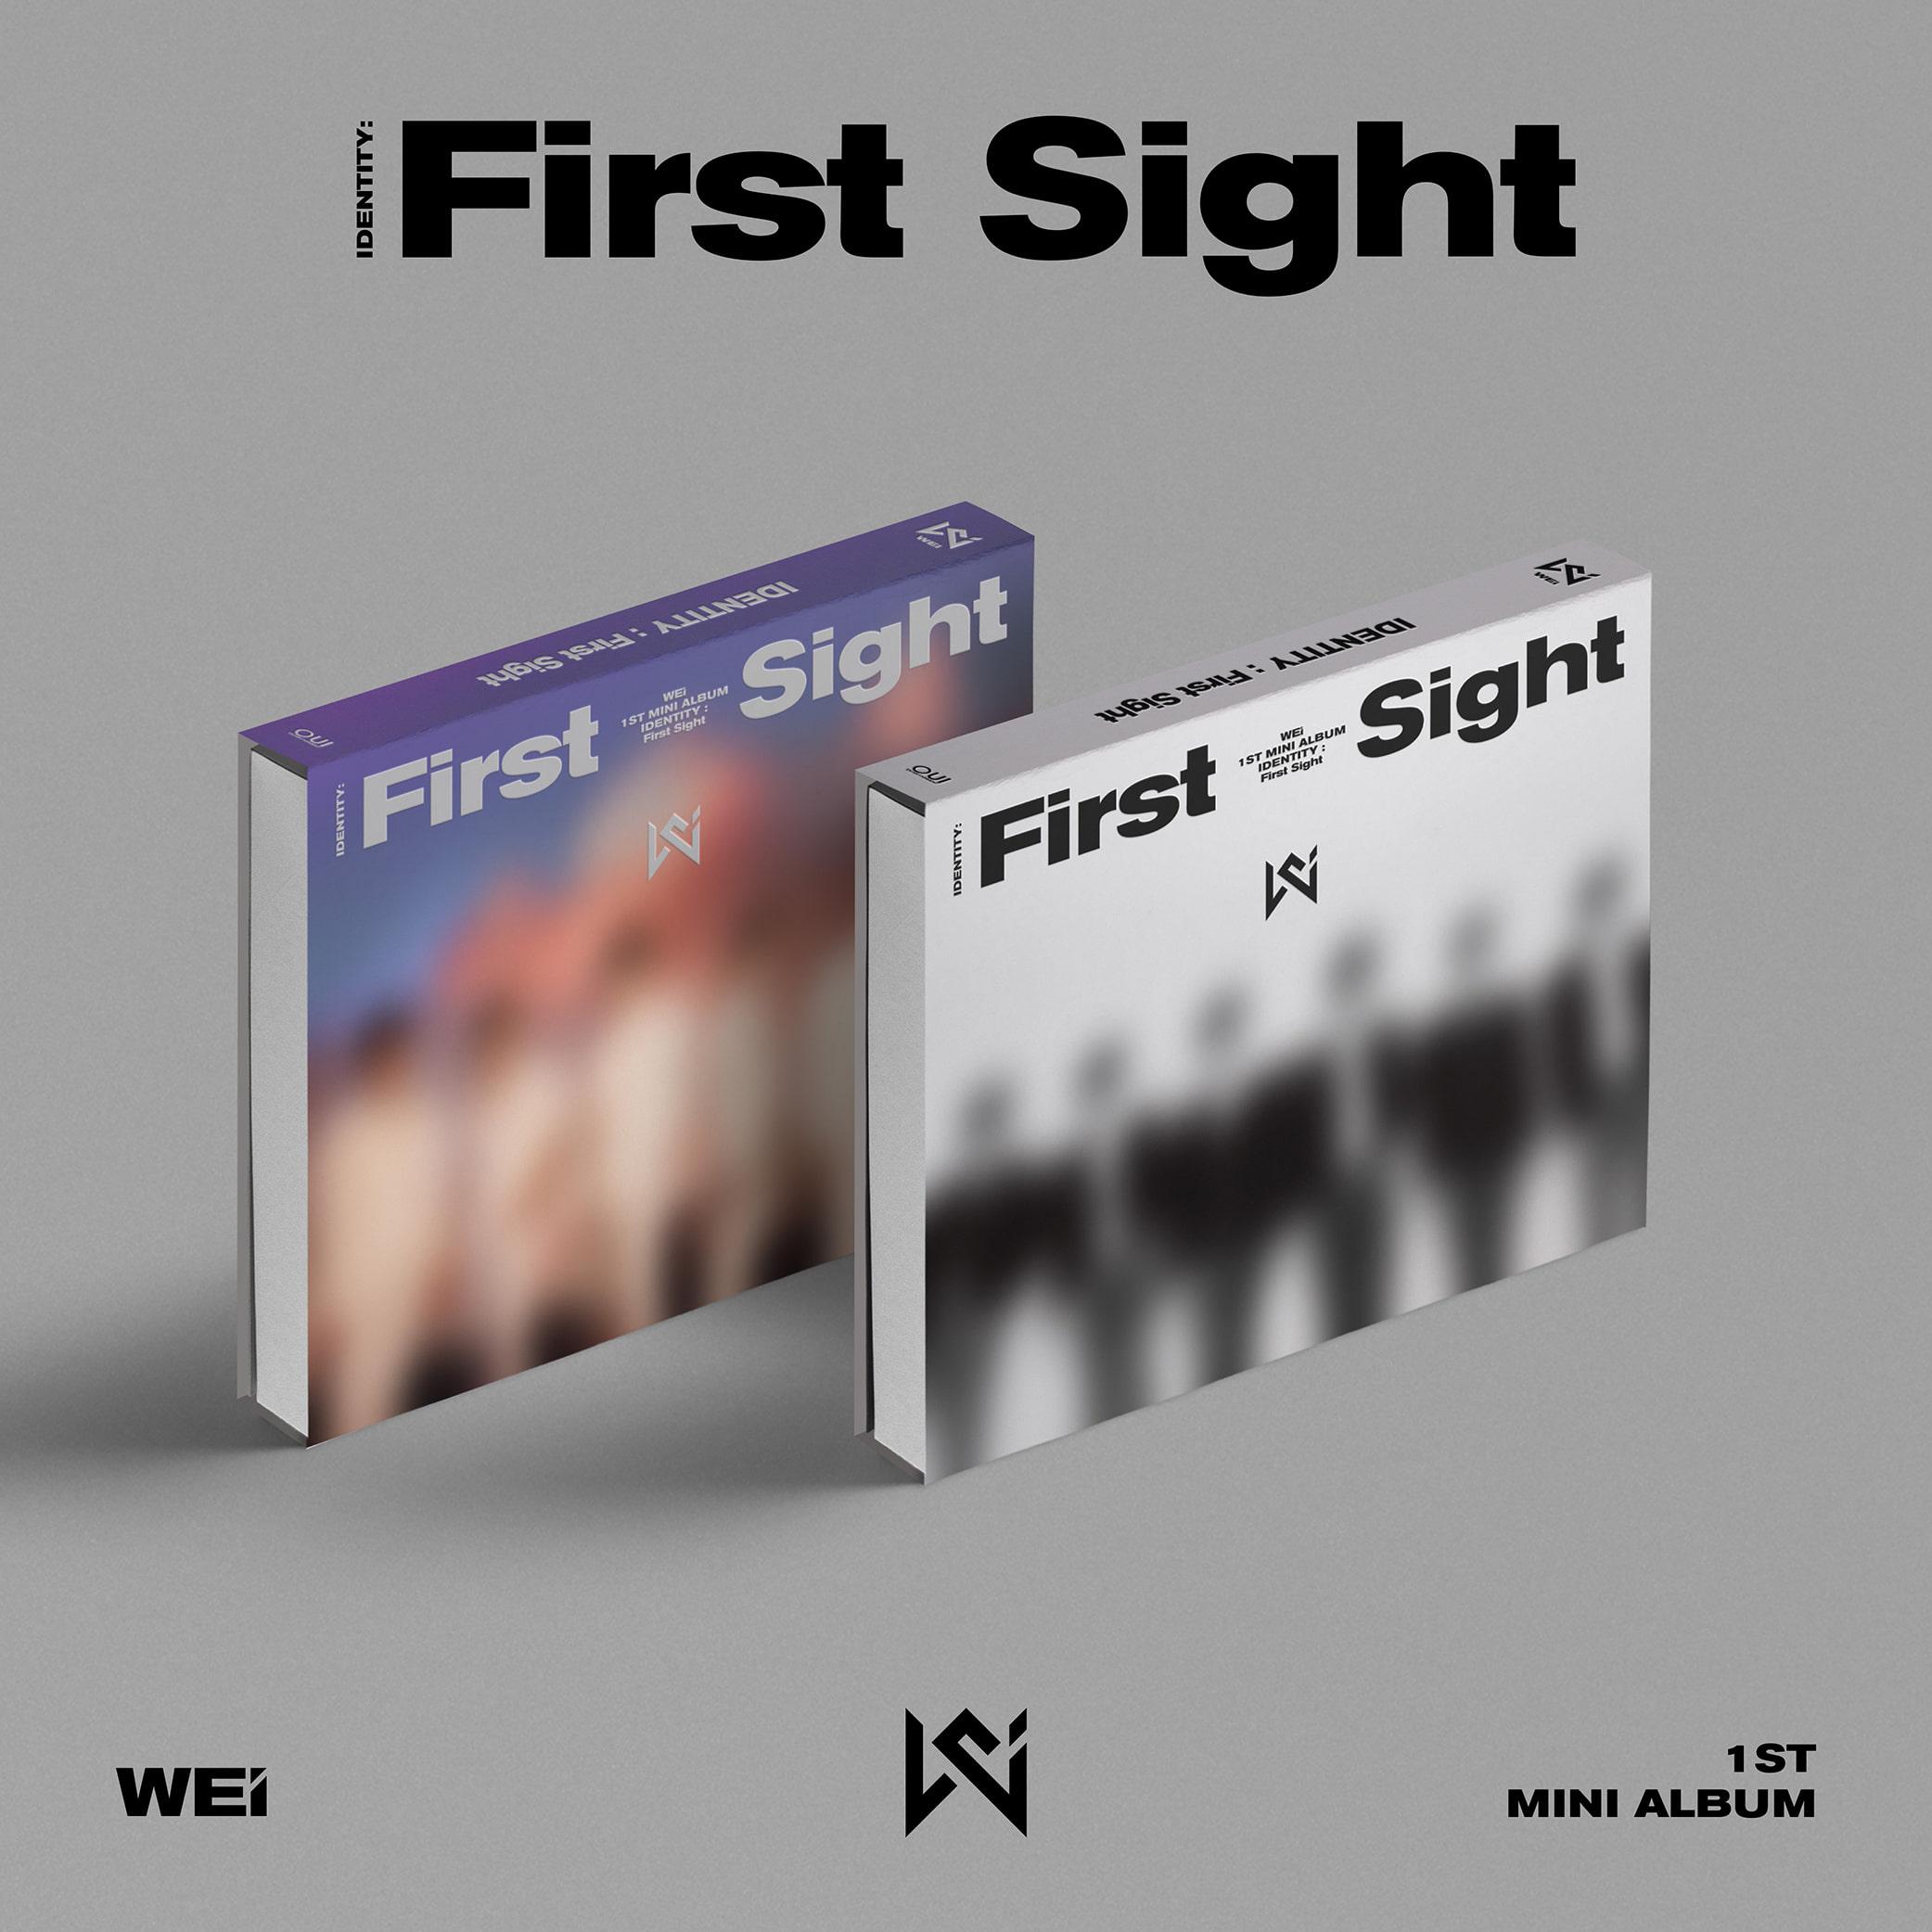 WEi - Mini Album Vol. 1 [IDENTITY : First Sight] (WE Ver. + i Ver.)케이팝스토어(kpop store)